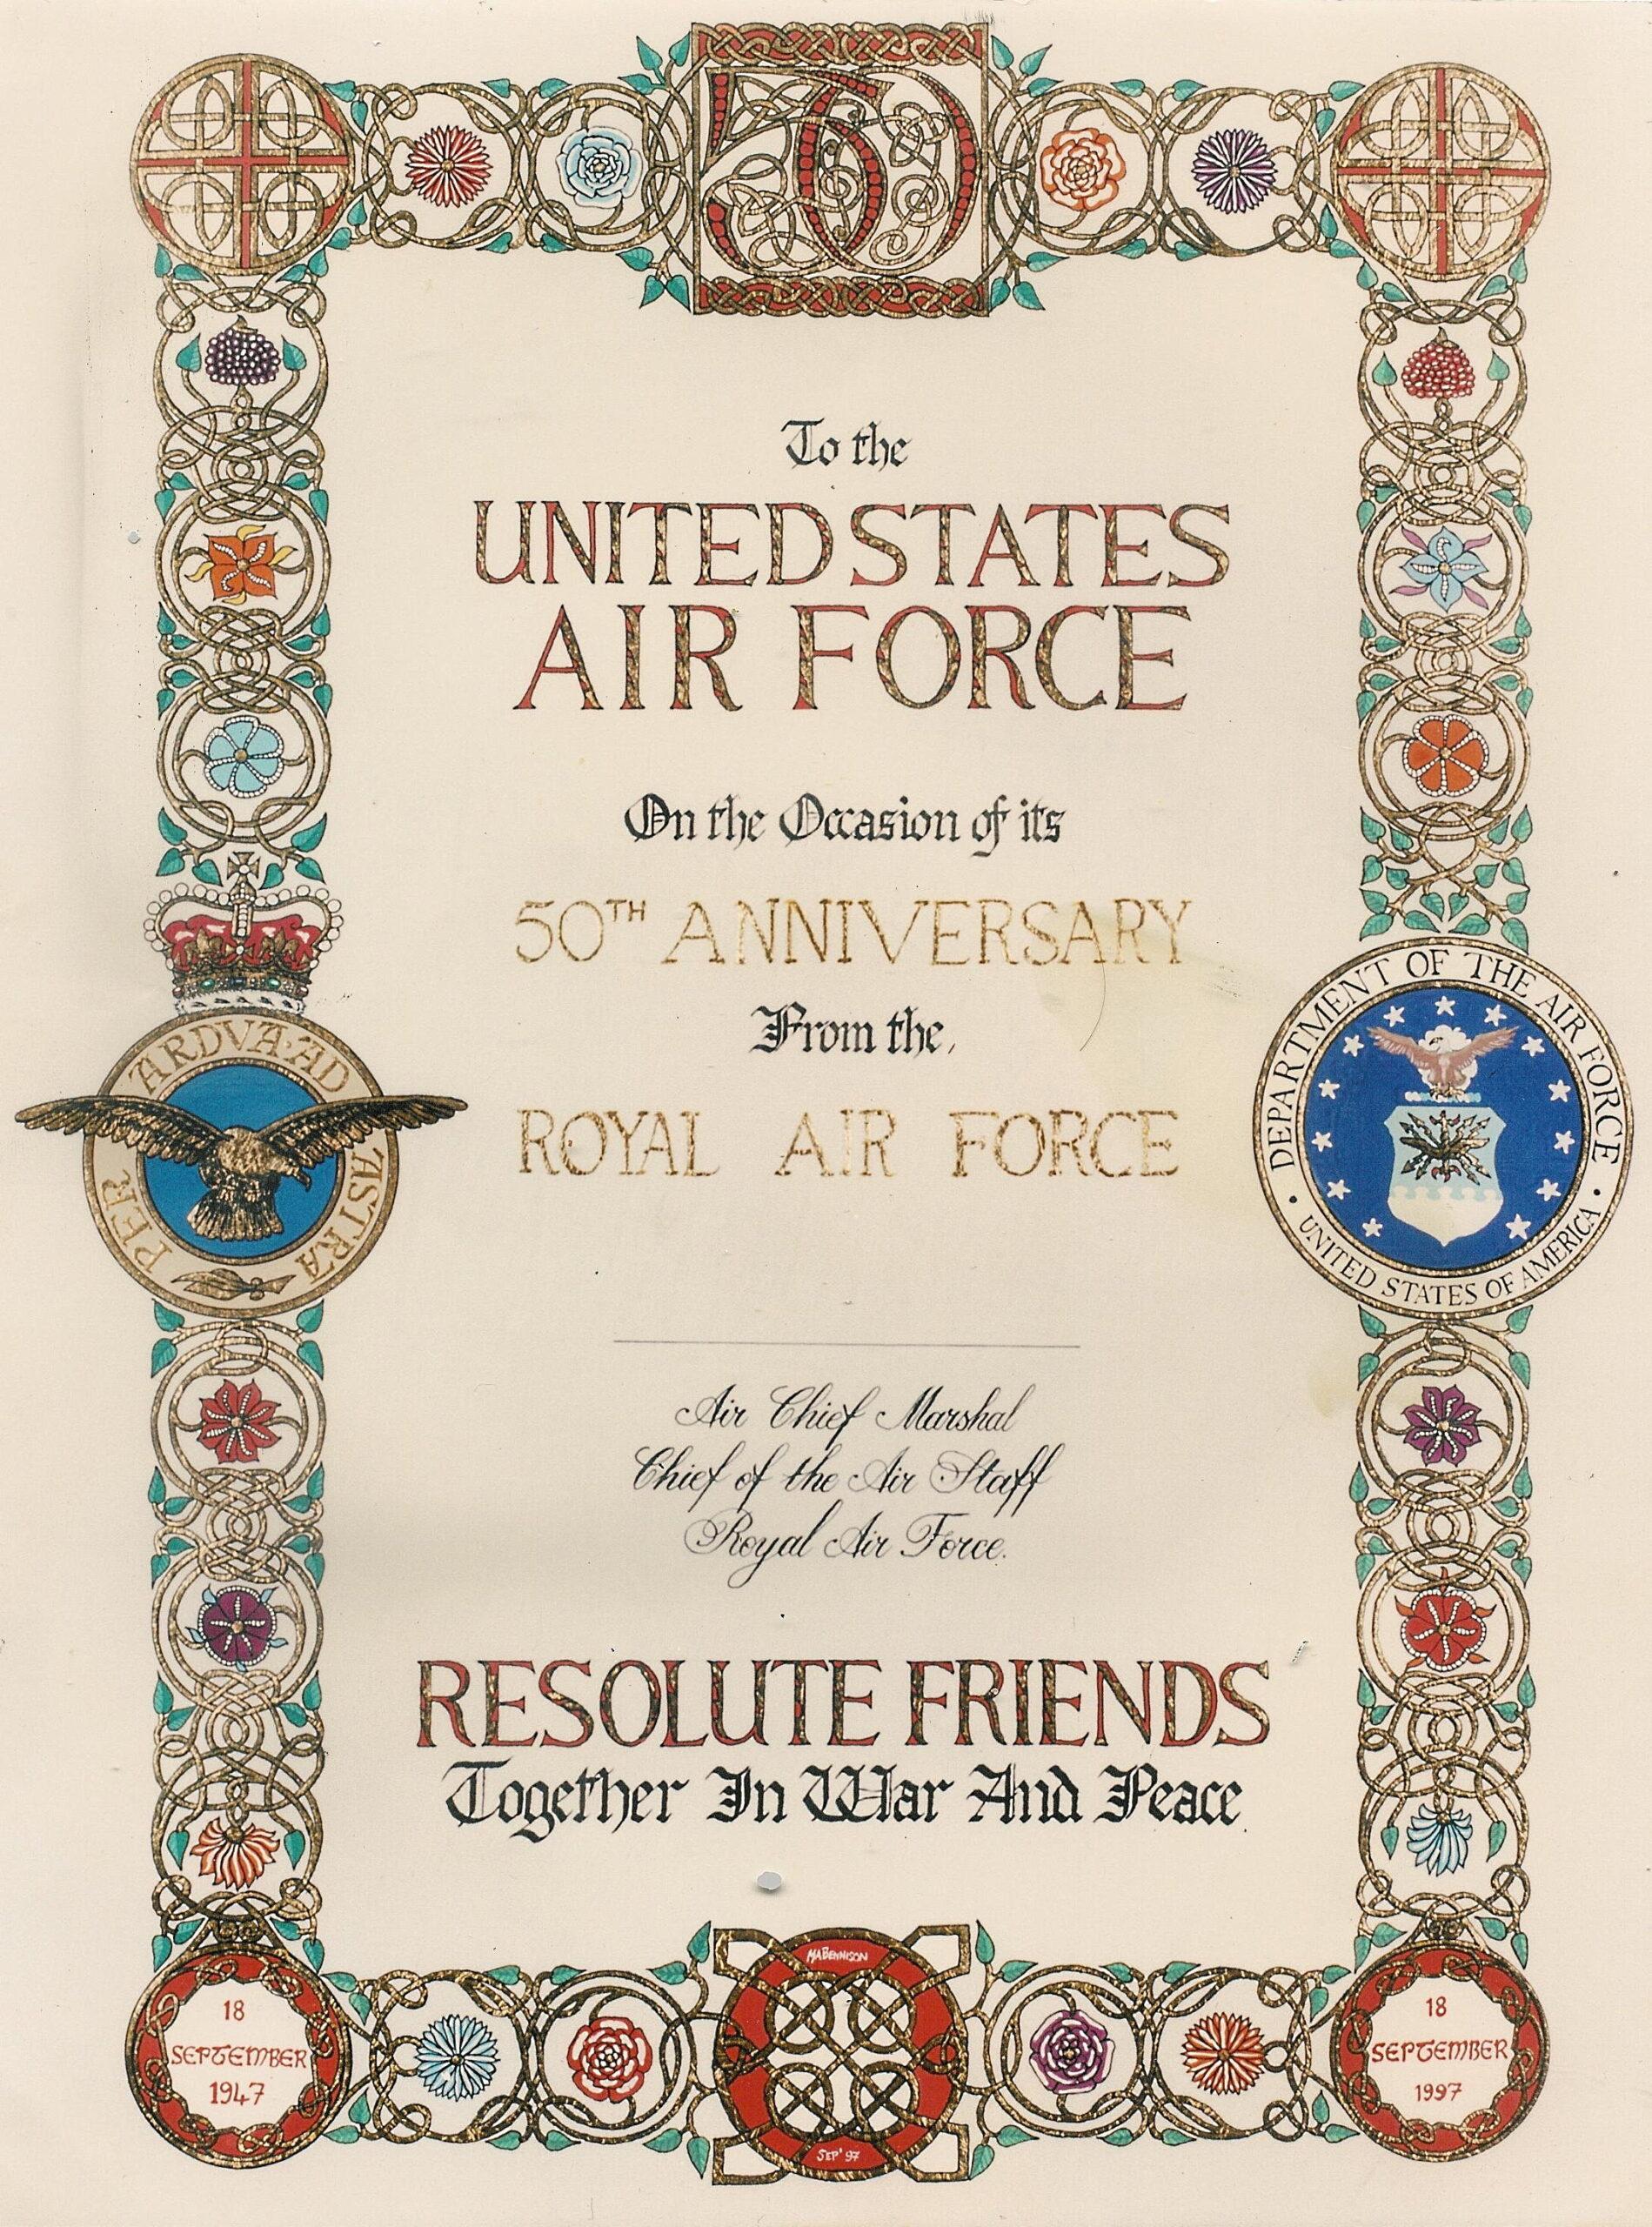 USAF 50th Anniversary website